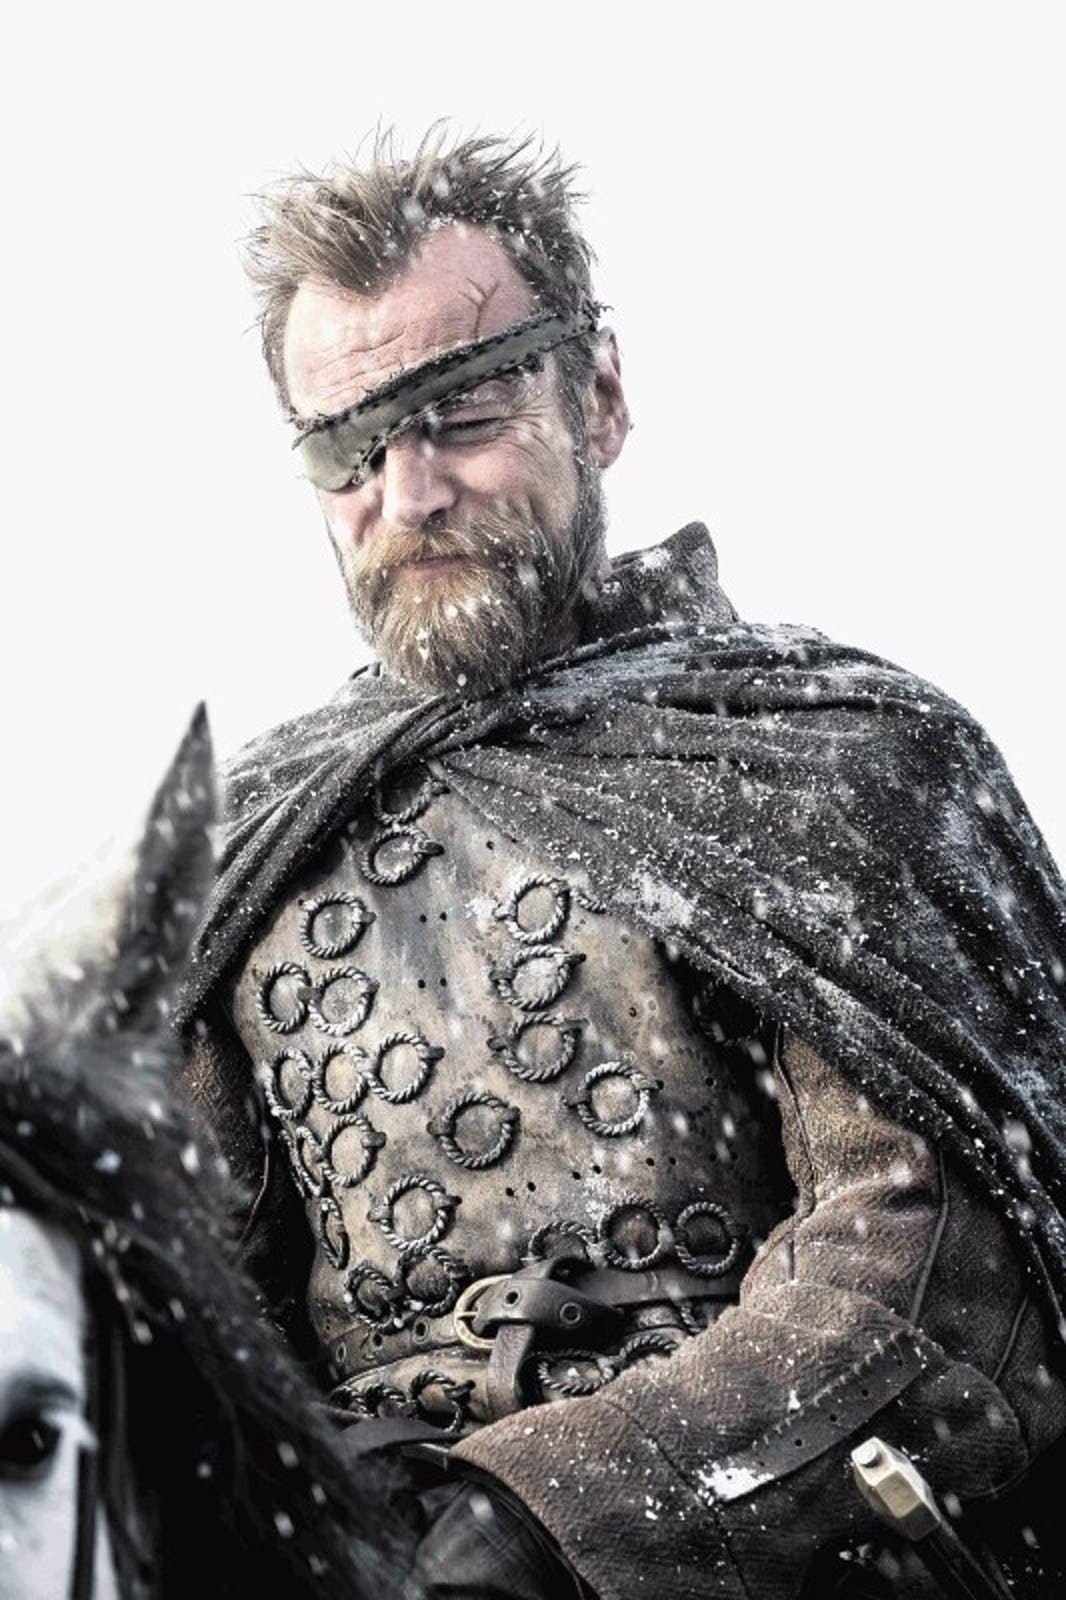 Berric Dondarrion returns to 'Game of Thrones' Season 7